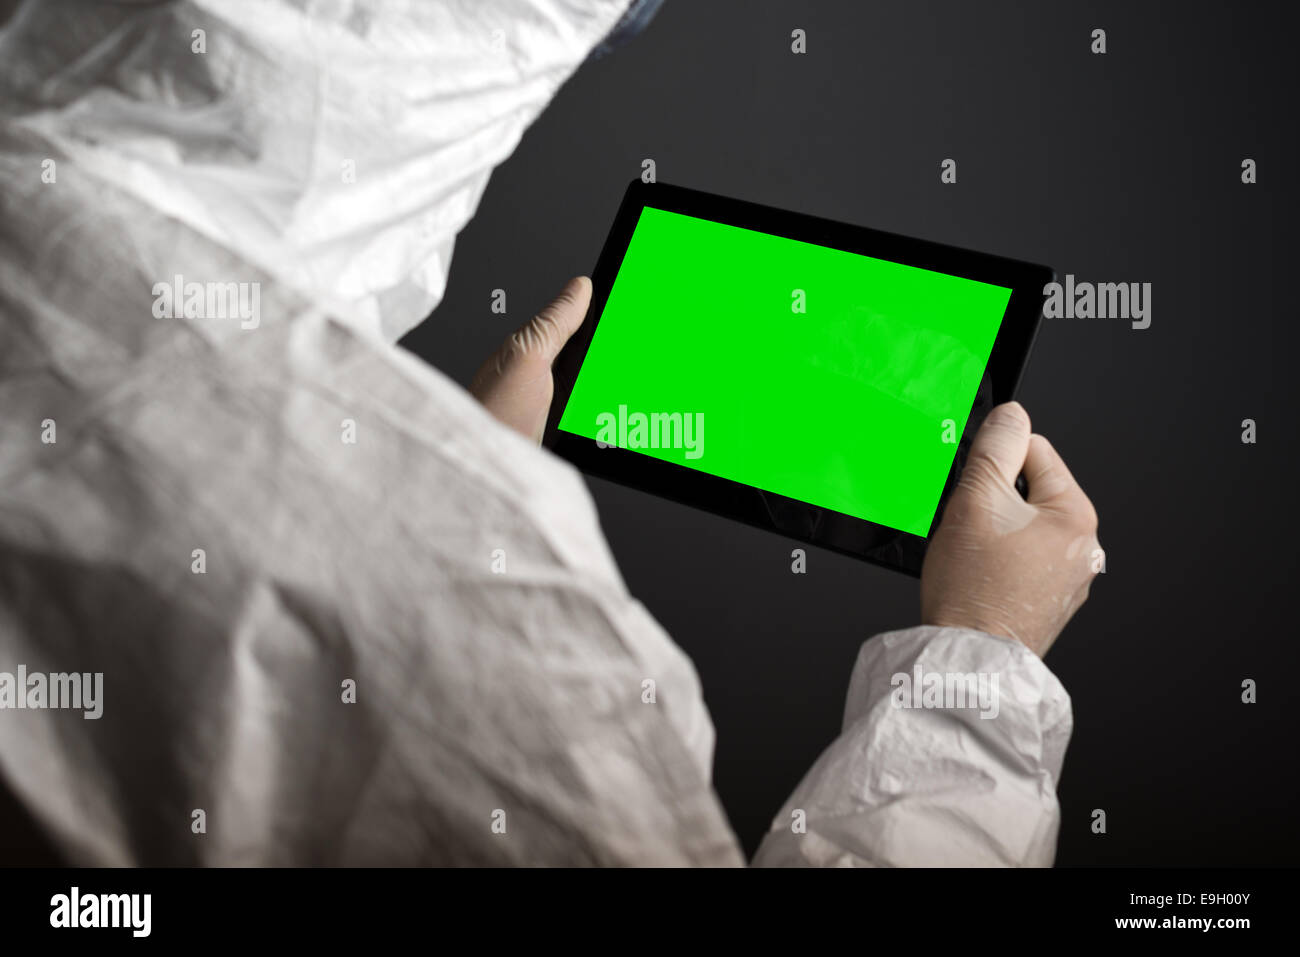 Chemiker mit digital-Tablette mit leeren grünen Bildschirm. Stockbild